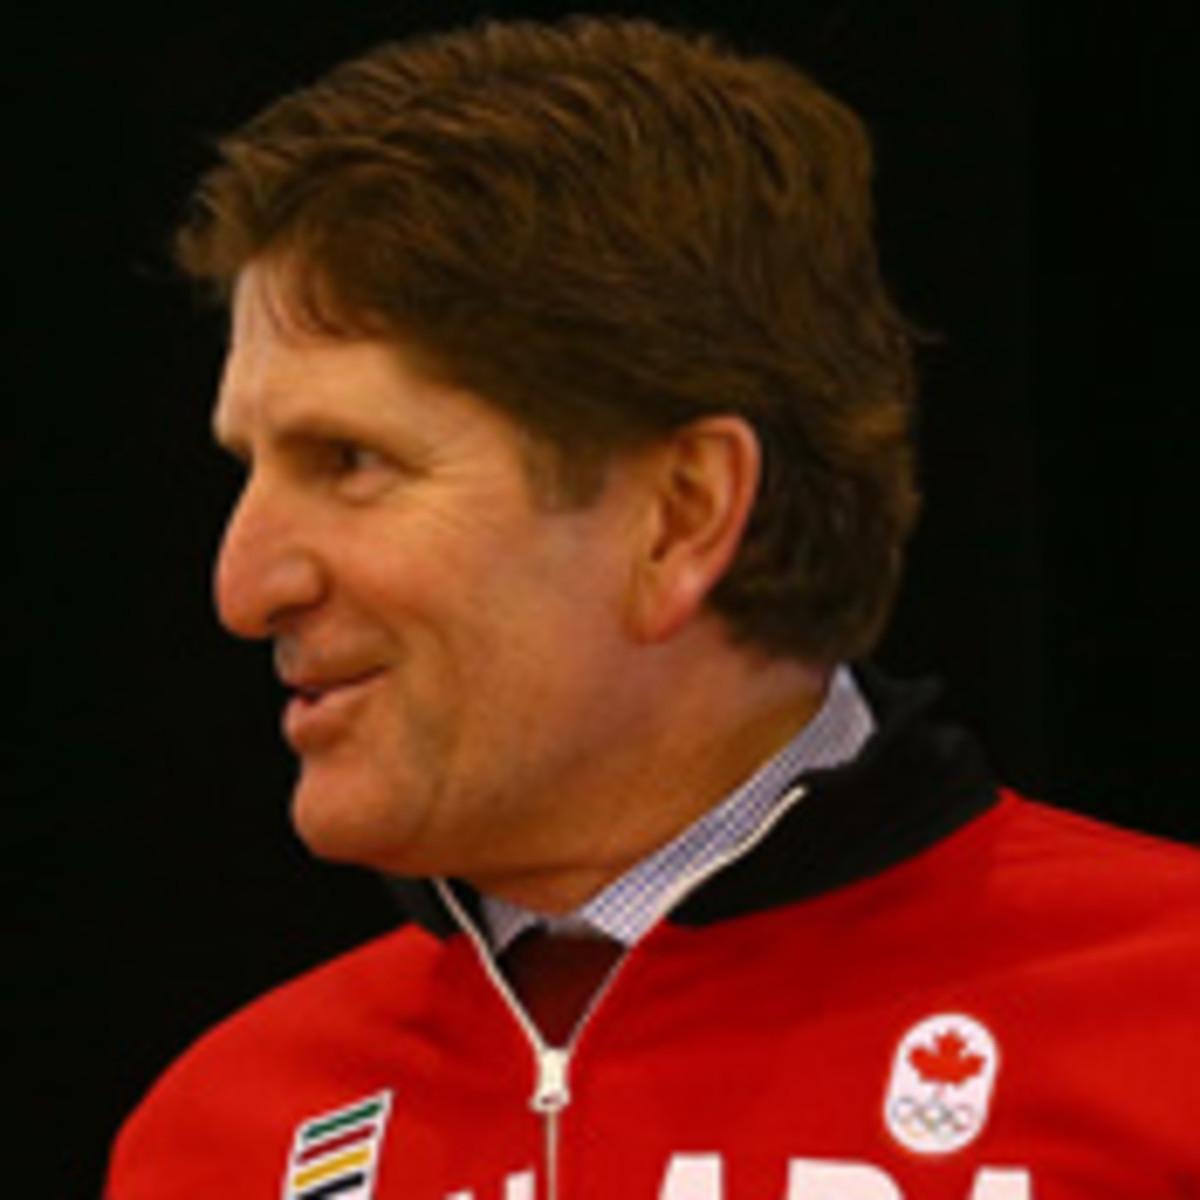 mike babcock 2014 men's olympic hockey canada